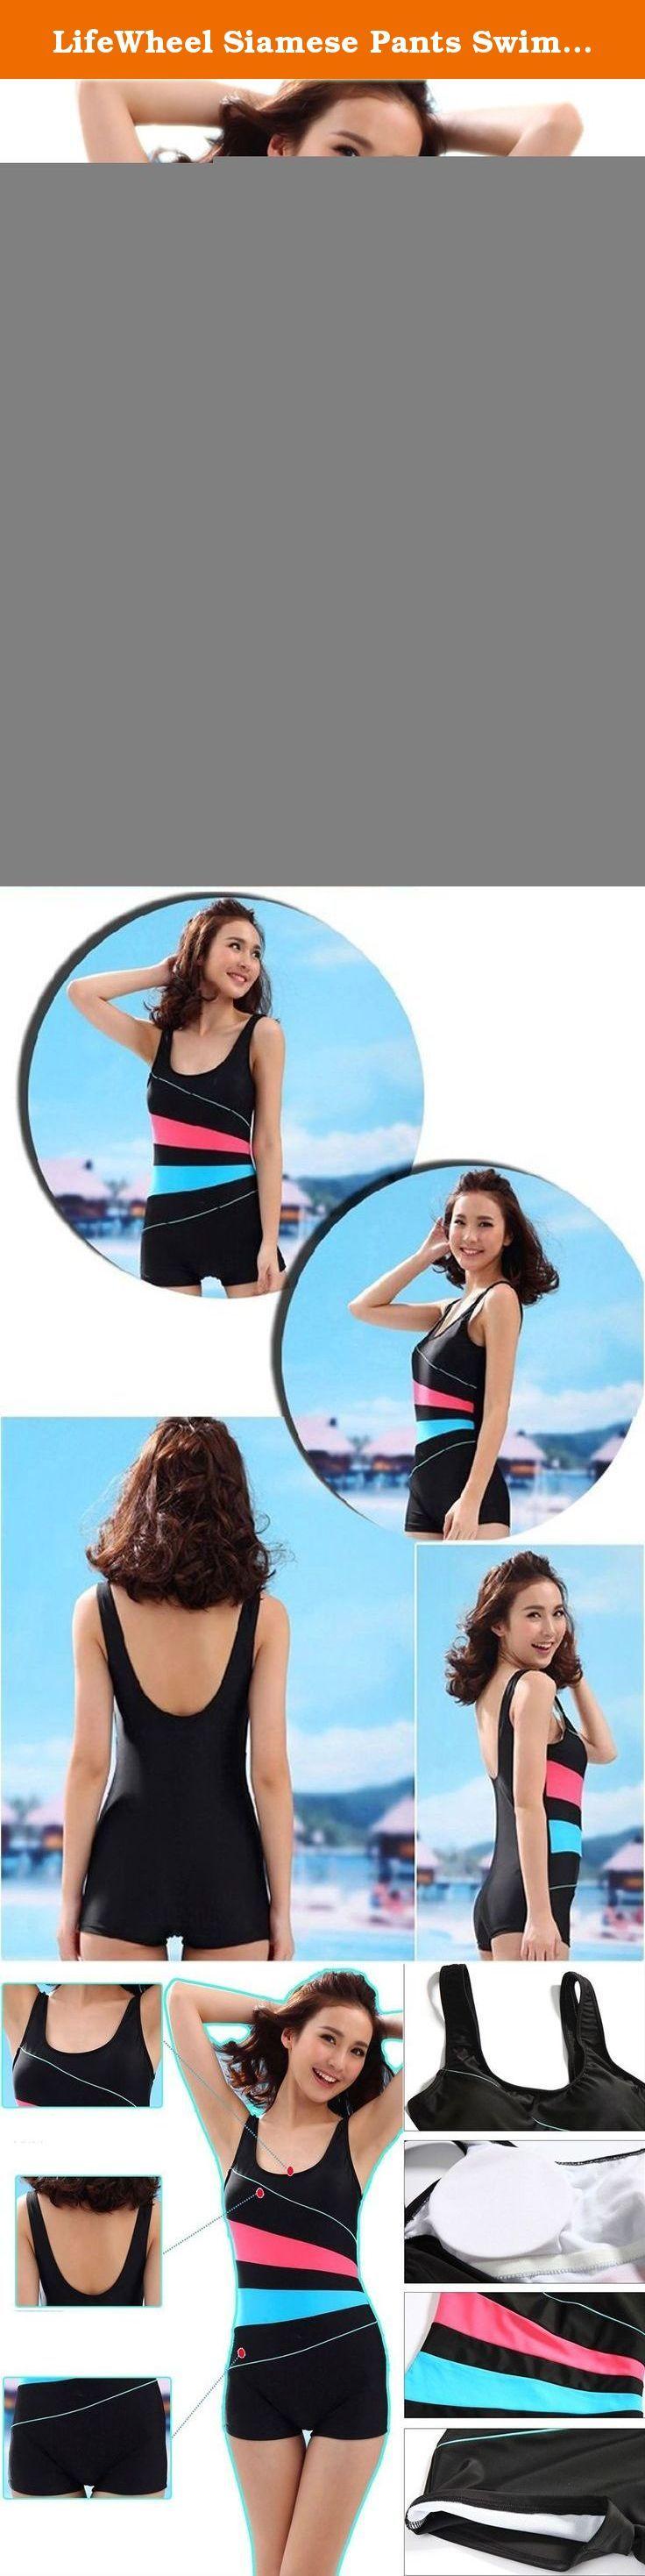 LifeWheel Siamese Pants Swimwear Movement Leisure High Elastic Swimsuit. Swimwear Size: (1cm=0.39inch) Size L: -----Bra 70A/B/C 75A/B Size L: -----Suggest Height: 150/165cm ---Suggest Weight: 37.5/50.0kg Size XL: ----Bra 75A/B/C 80A/B Size XL: ----Suggest Height: 155/165cm ---Suggest Weight: 47.5/57.5kg Size XXL: ---Bra 80A/B/C 85A/B Size XXL: ---Suggest Height: 160/170cm ---Suggest Weight: 55.0/65.0kg Size XXXL: --Bra 85A/B/C 90A/B Size XXXL: --Suggest Height: 160/170cm ---Suggest…